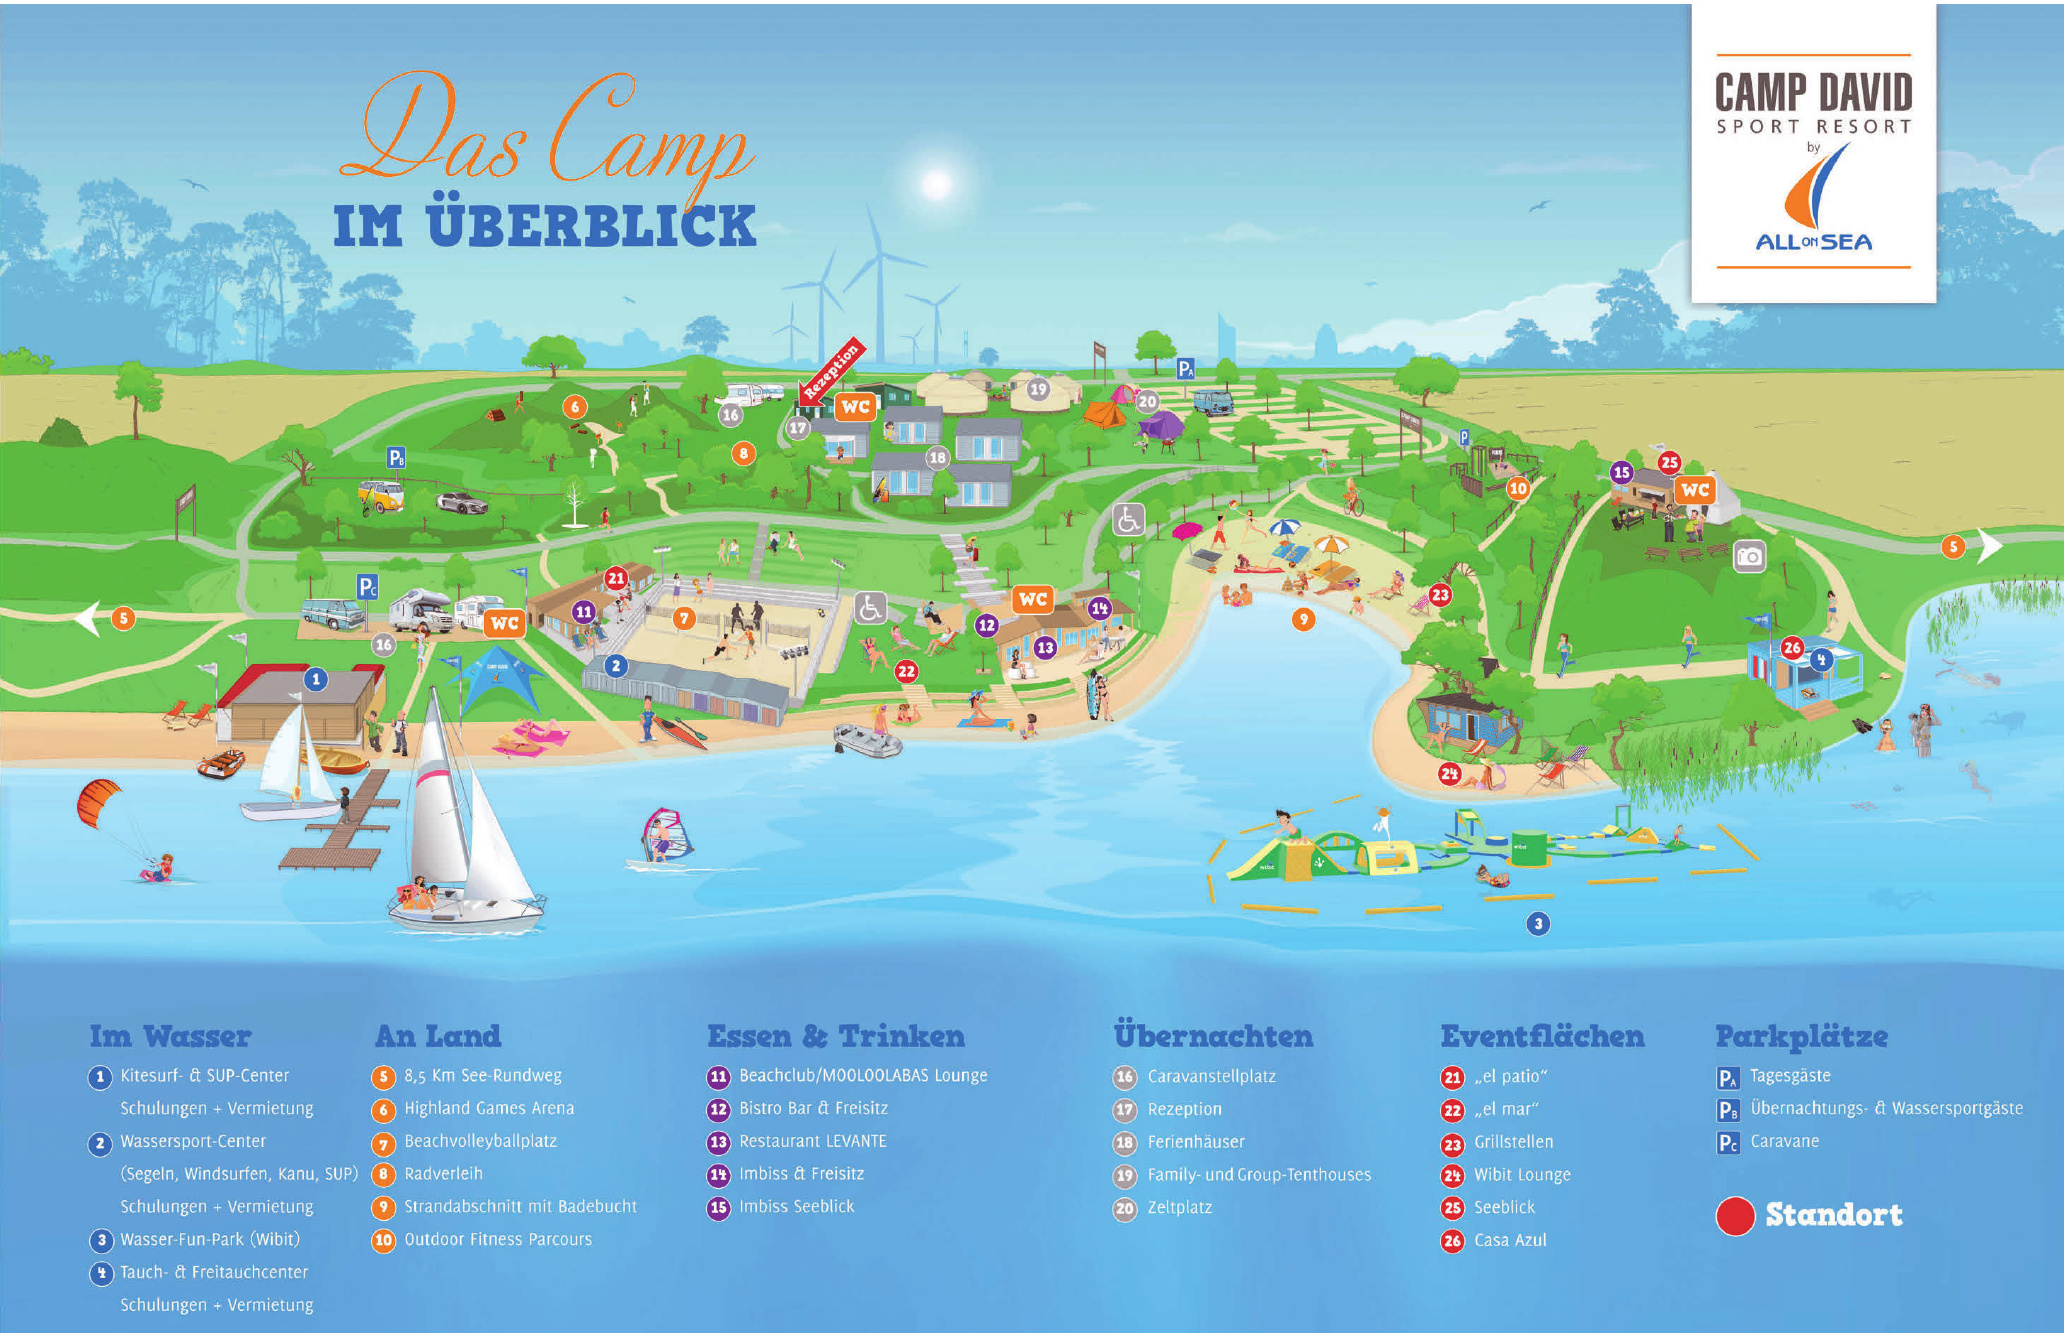 Camp David Sport Resort by All-on-Sea